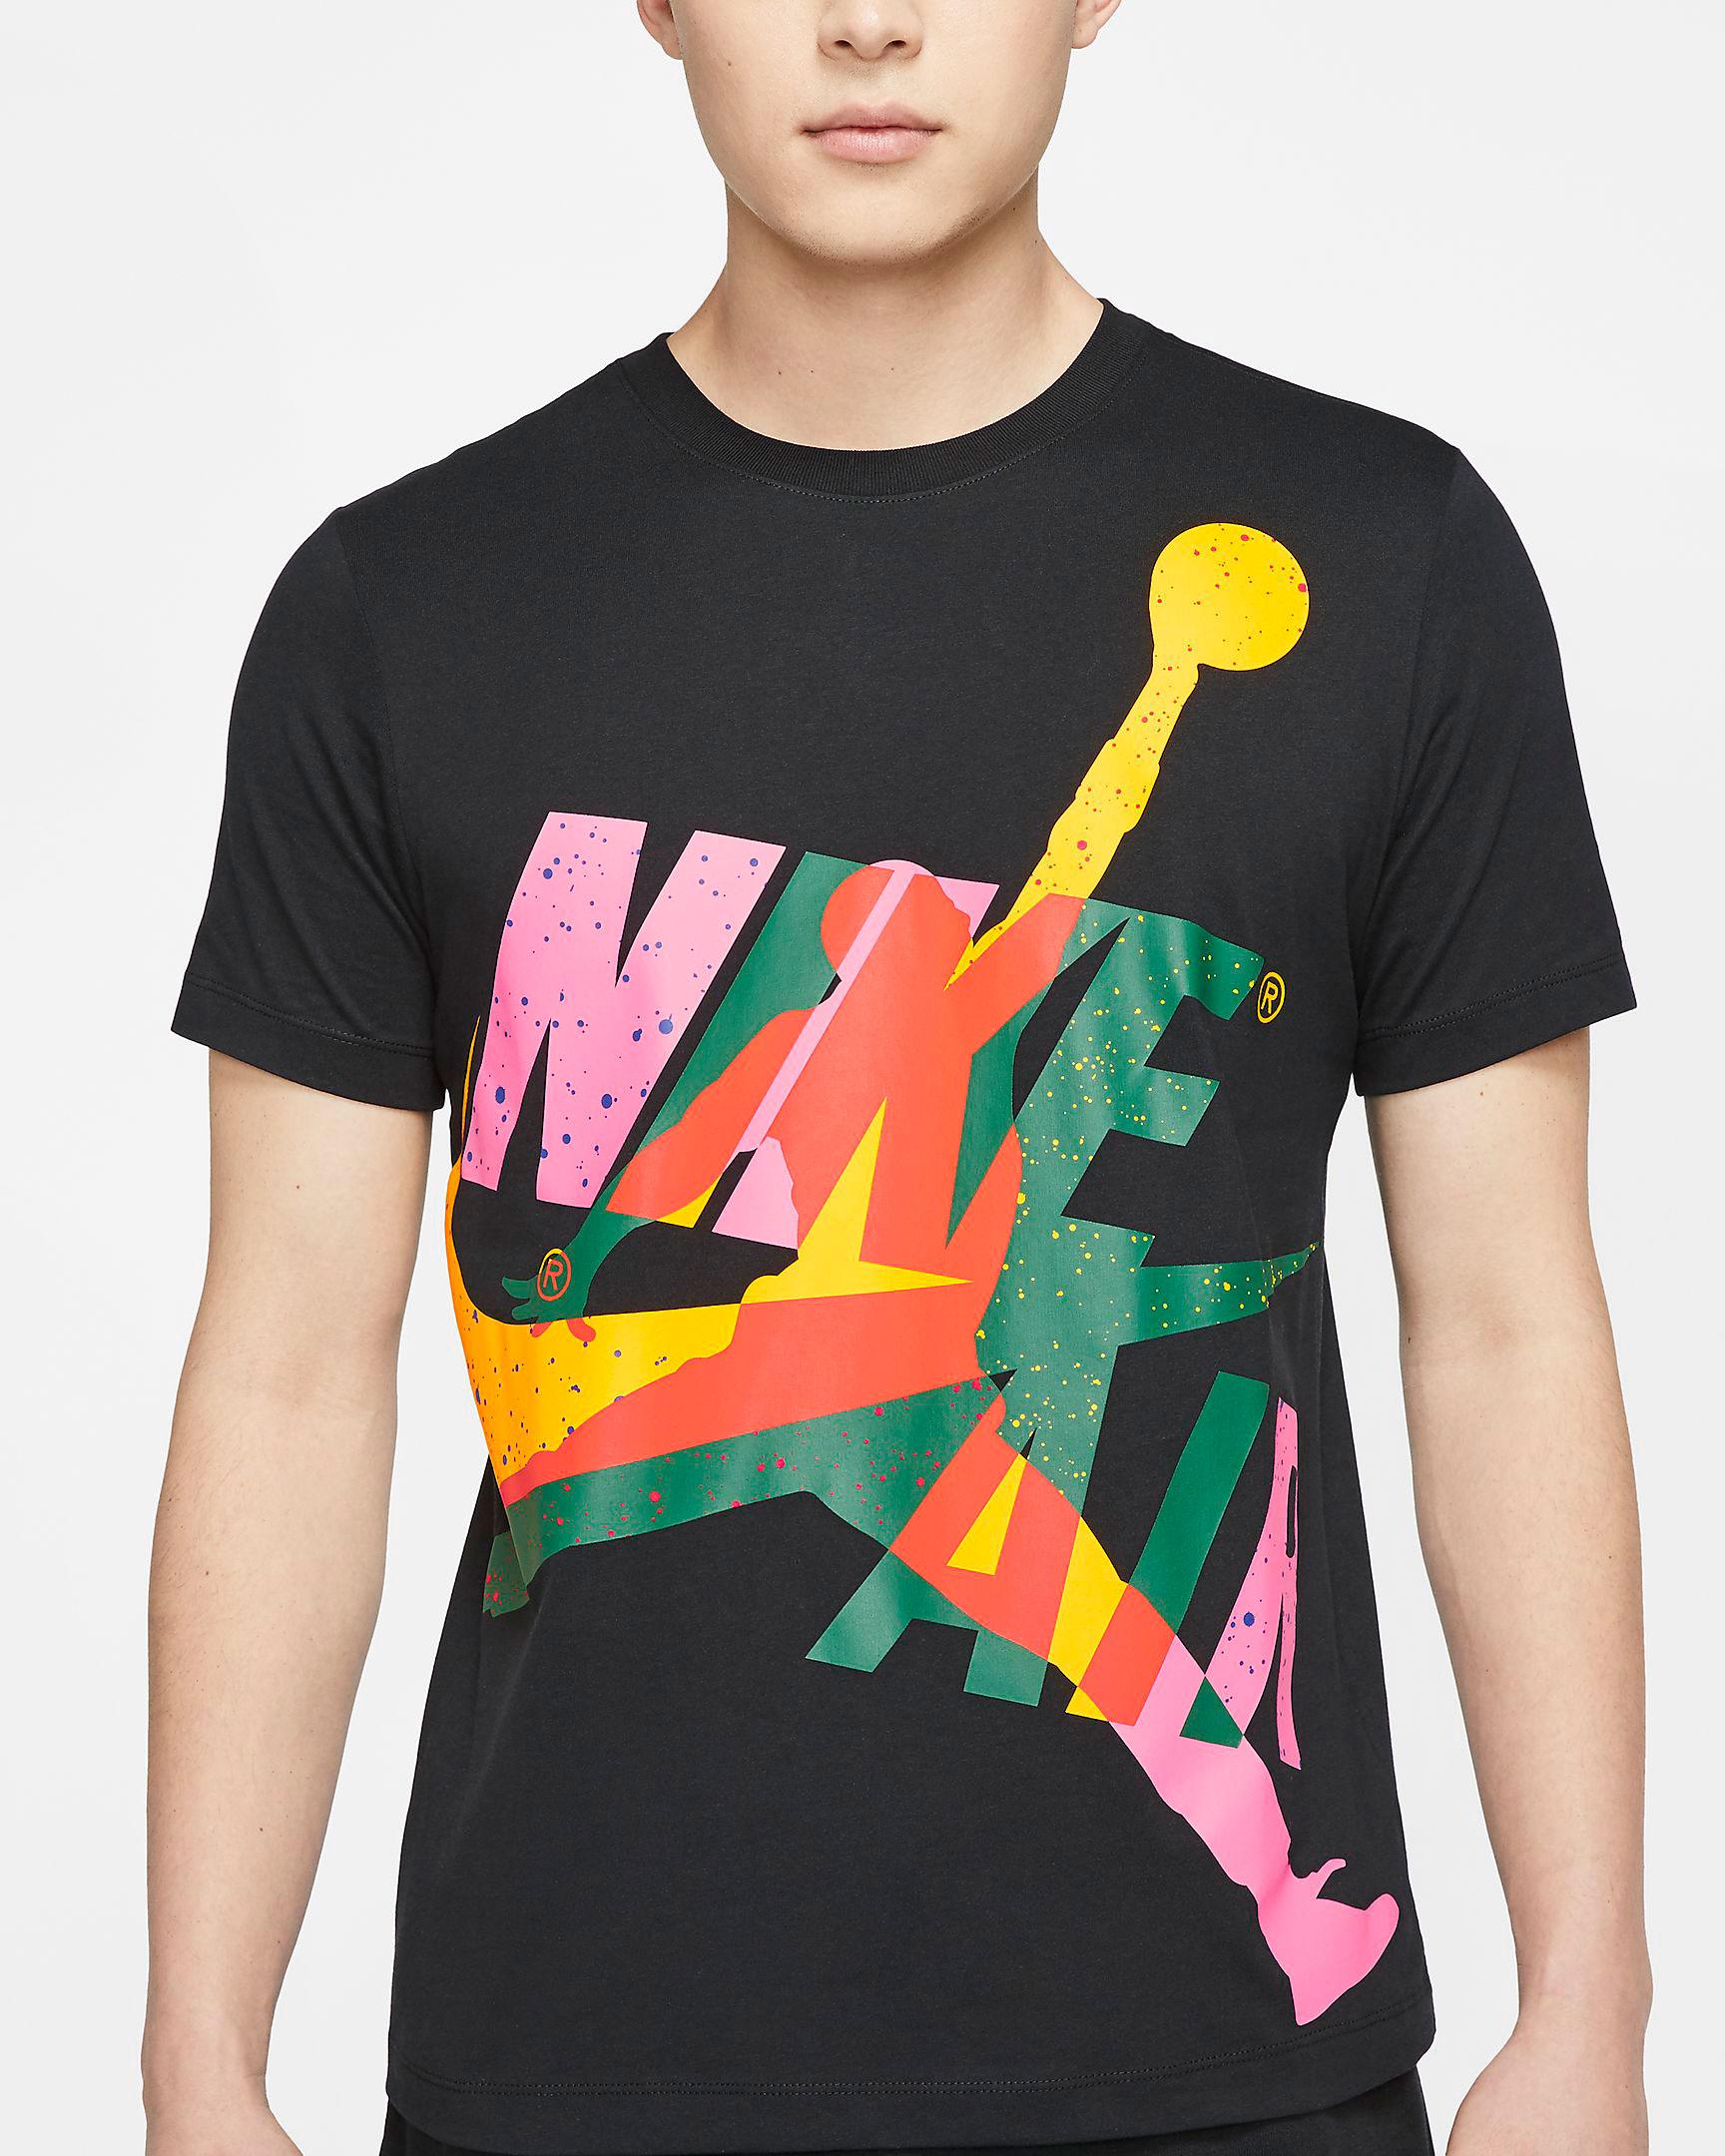 jordan-jumpman-classics-multi-color-black-shirt